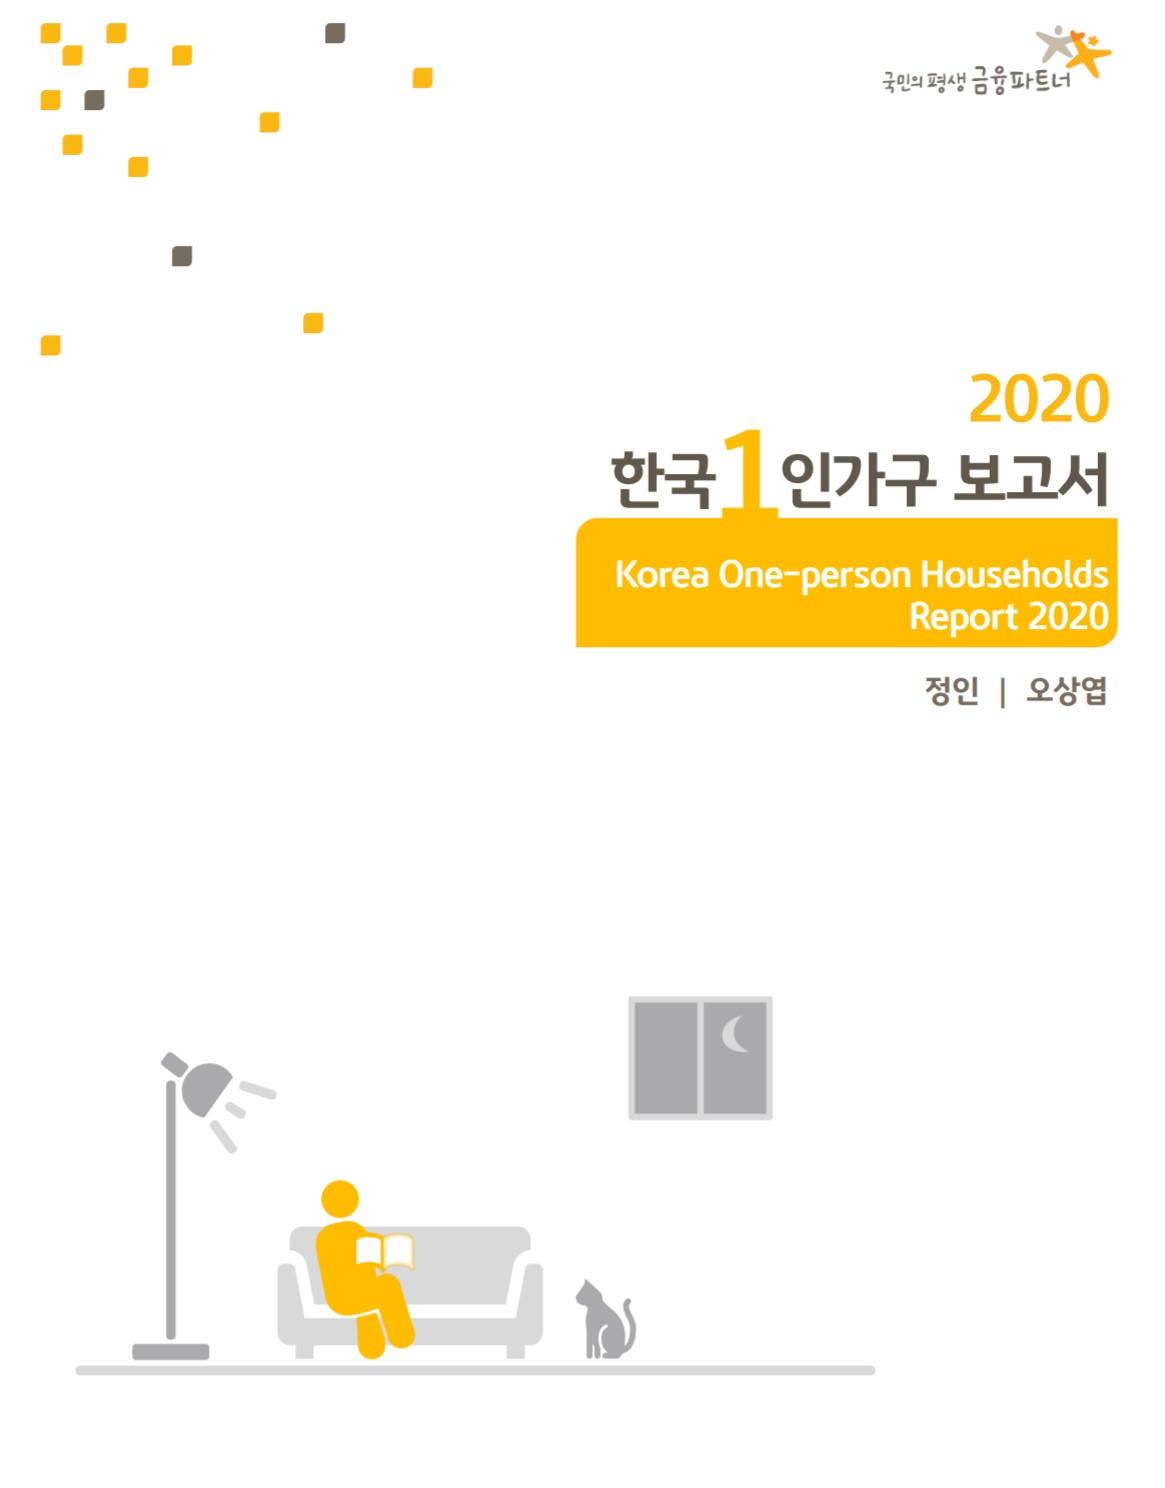 2020 KB 한국 1인가구 보고서